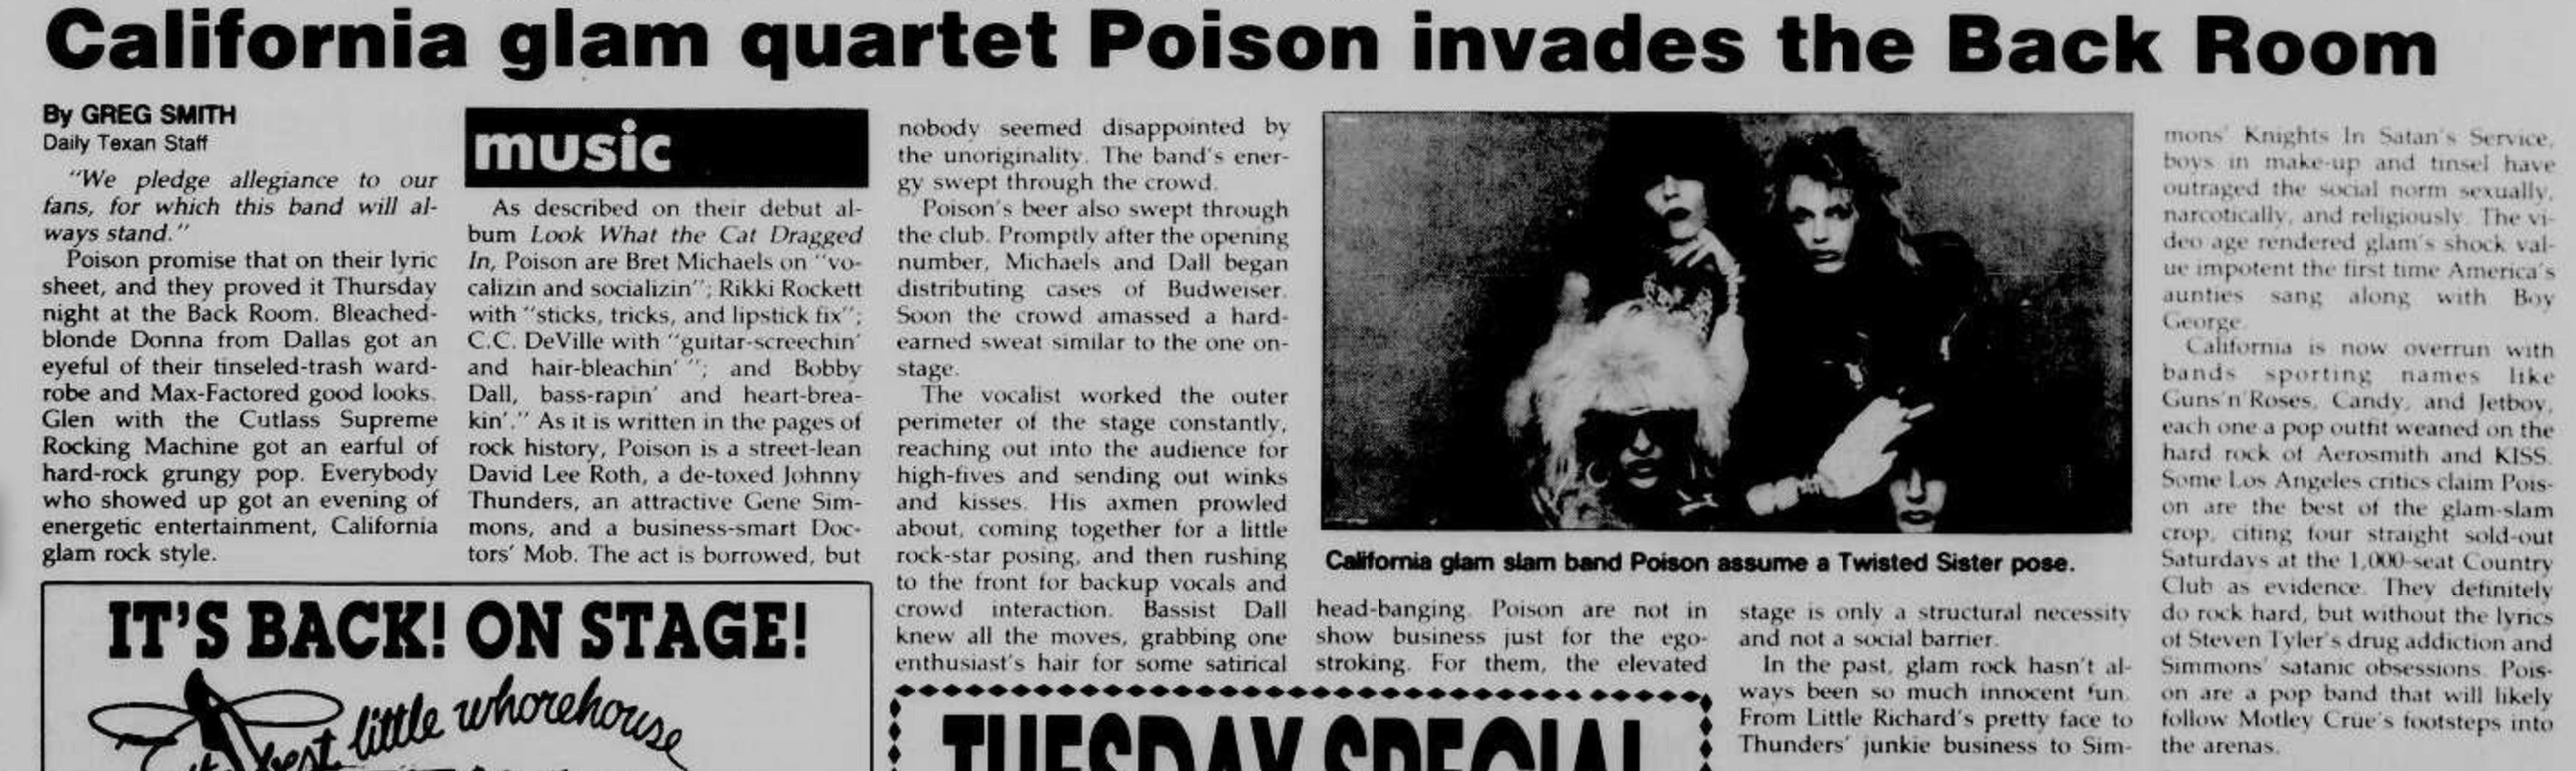 1986.06.24 - Austin Daily Texan - California Glam Quartet Poison Invades the Back Room Austin11